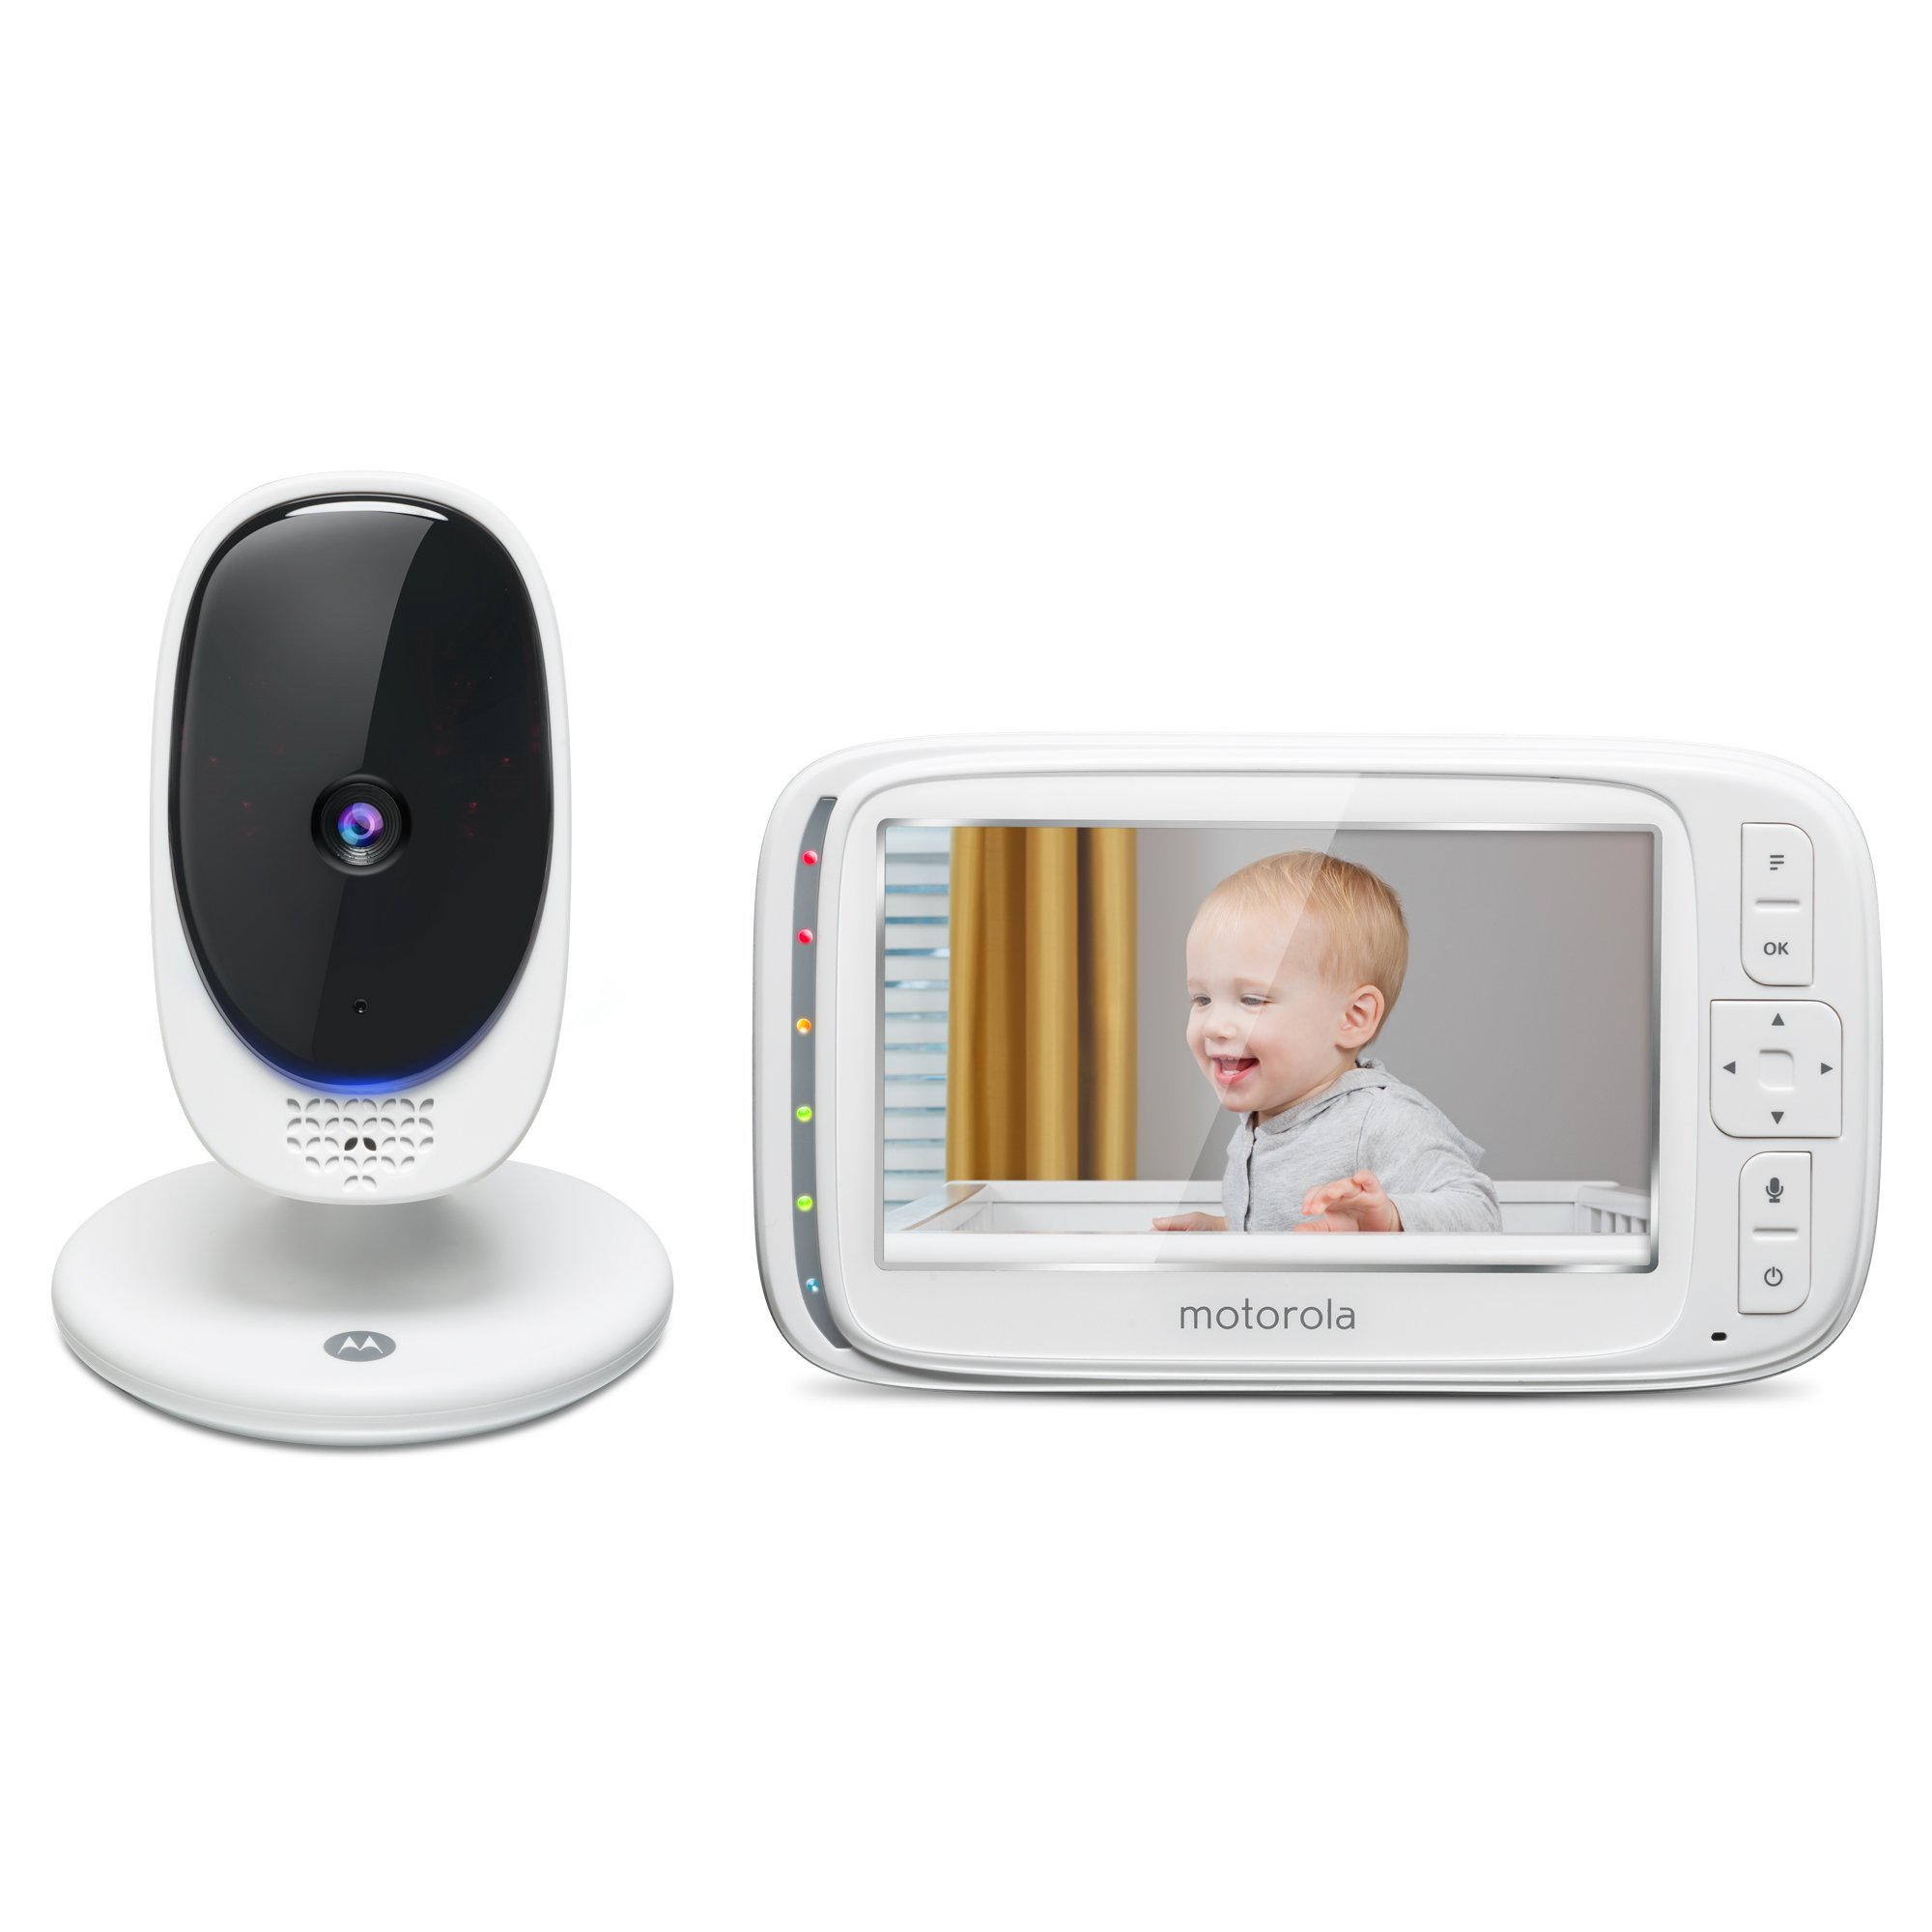 Motorola Comfort 50 Digital Video Audio Baby Monitor with 5 inch Color Screen by Motorola Baby (Image #1)